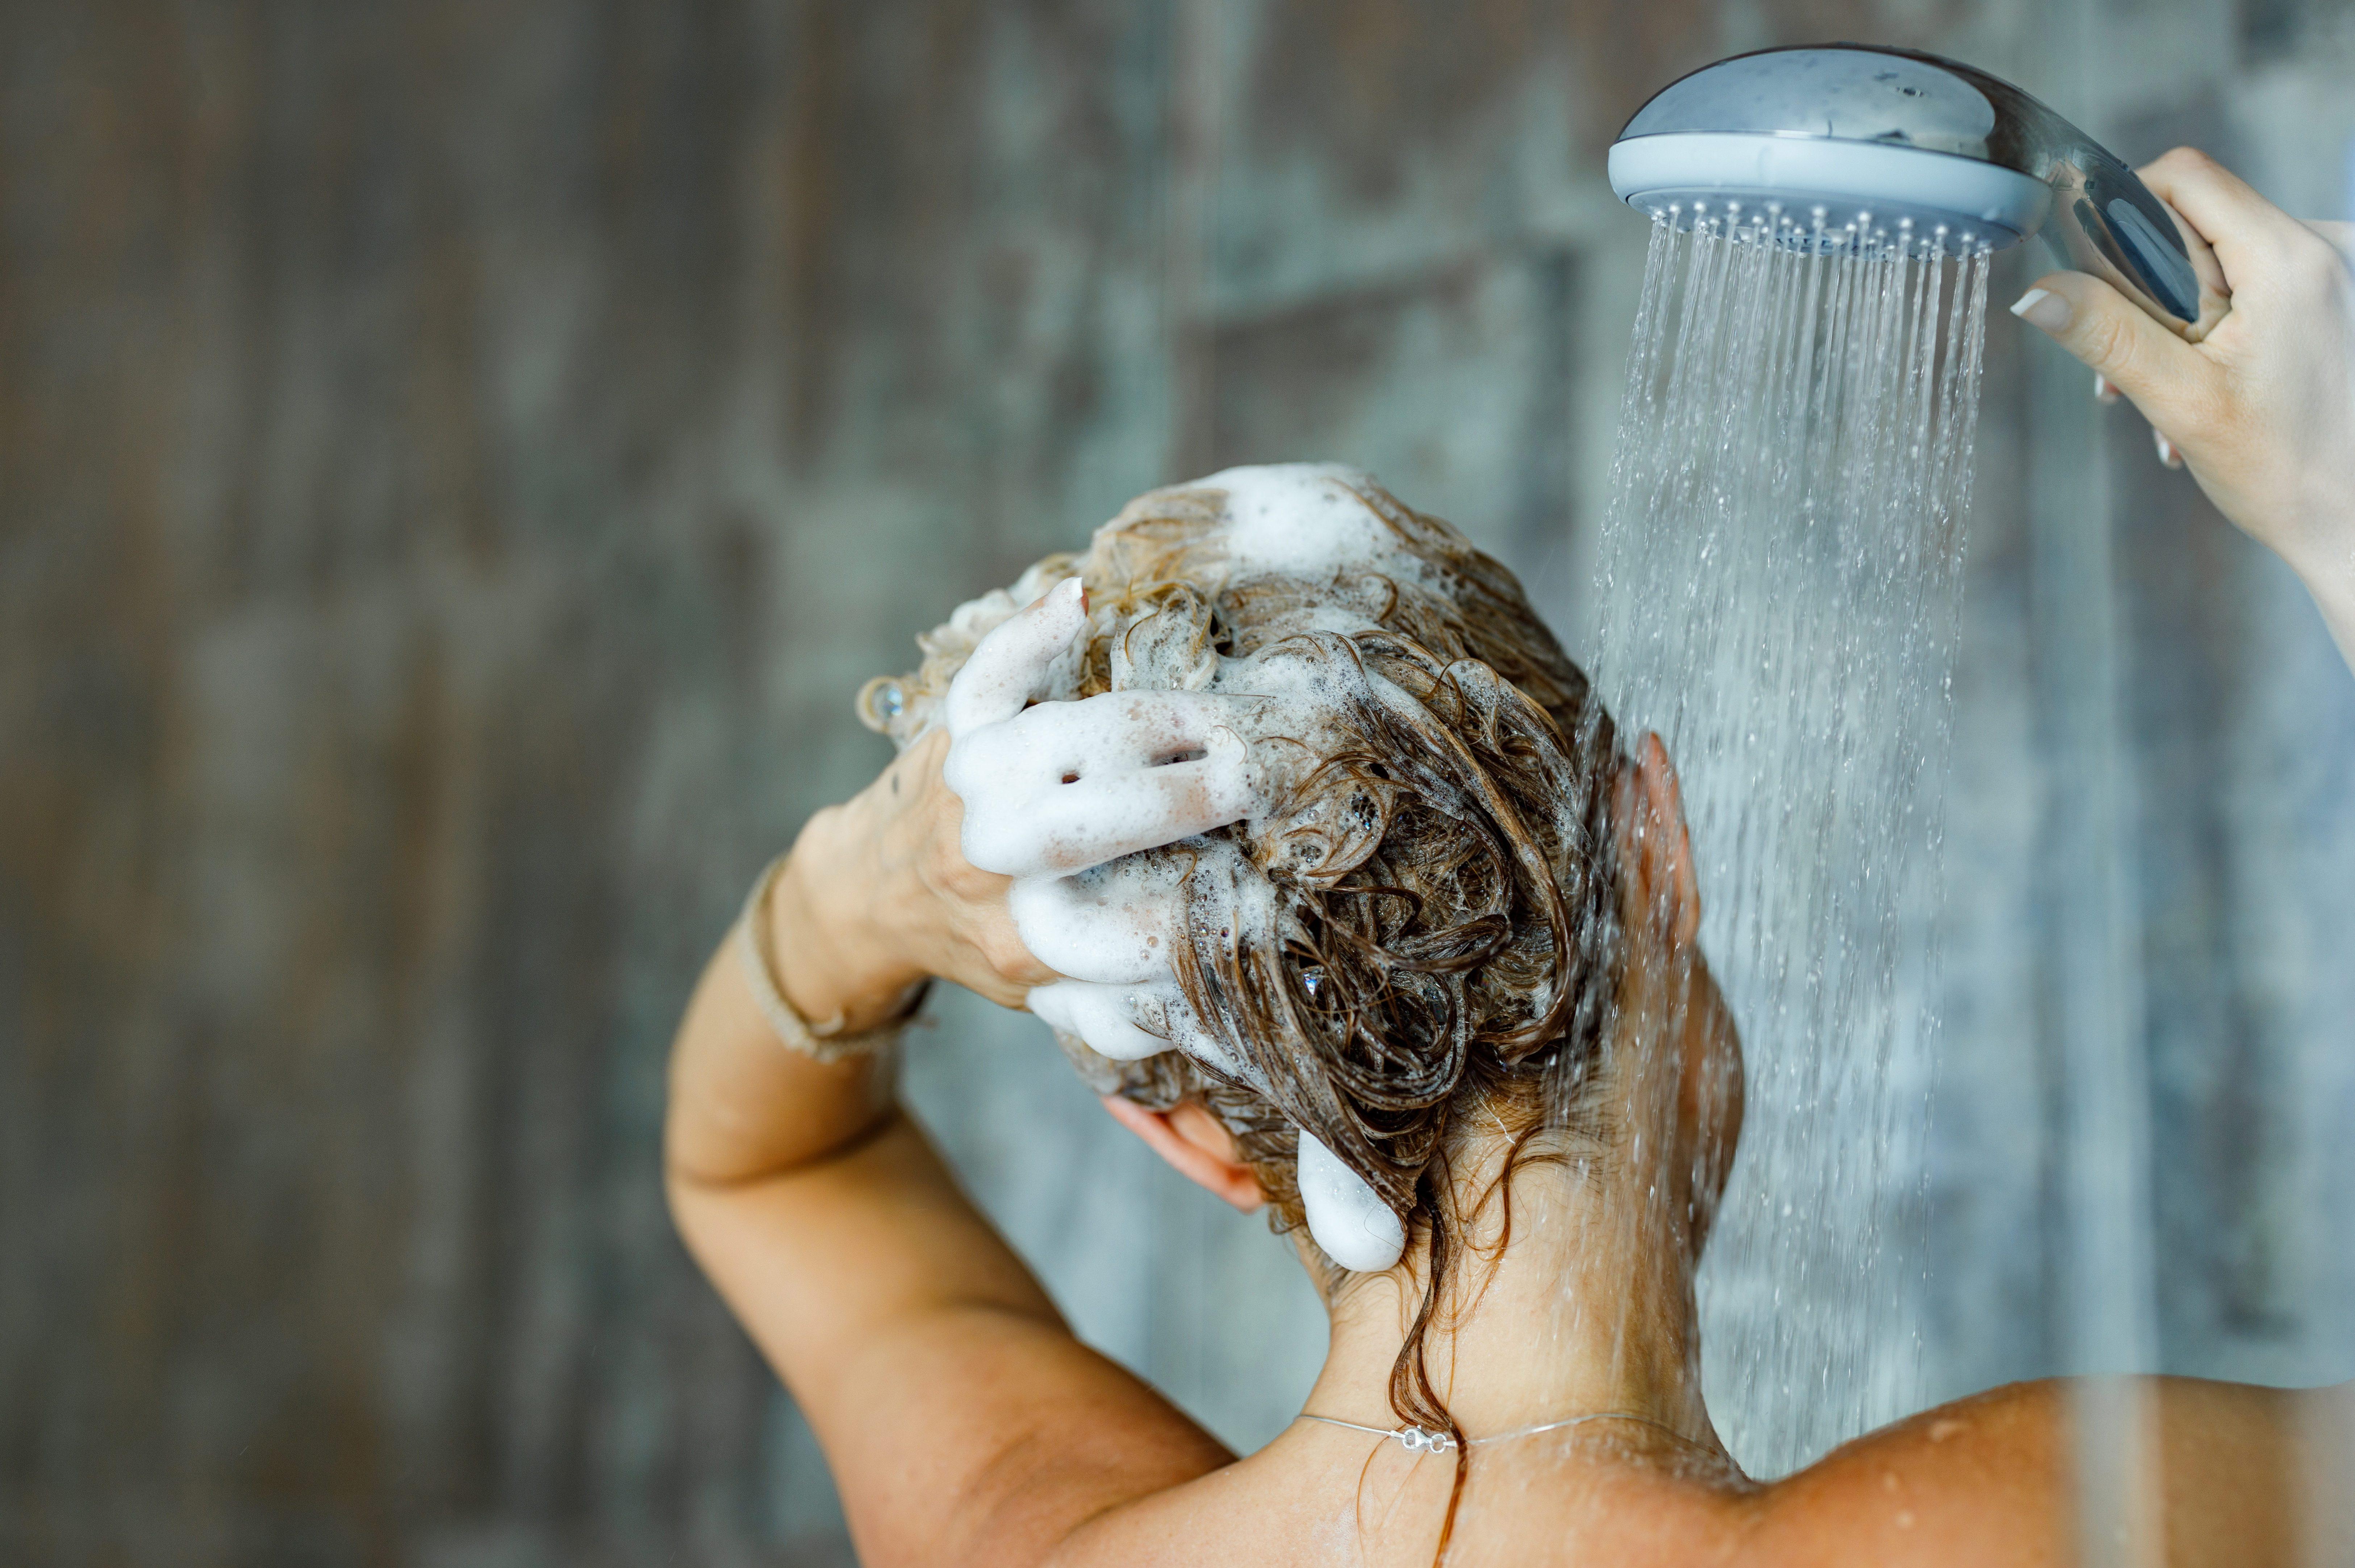 Washing hair with shampoo!